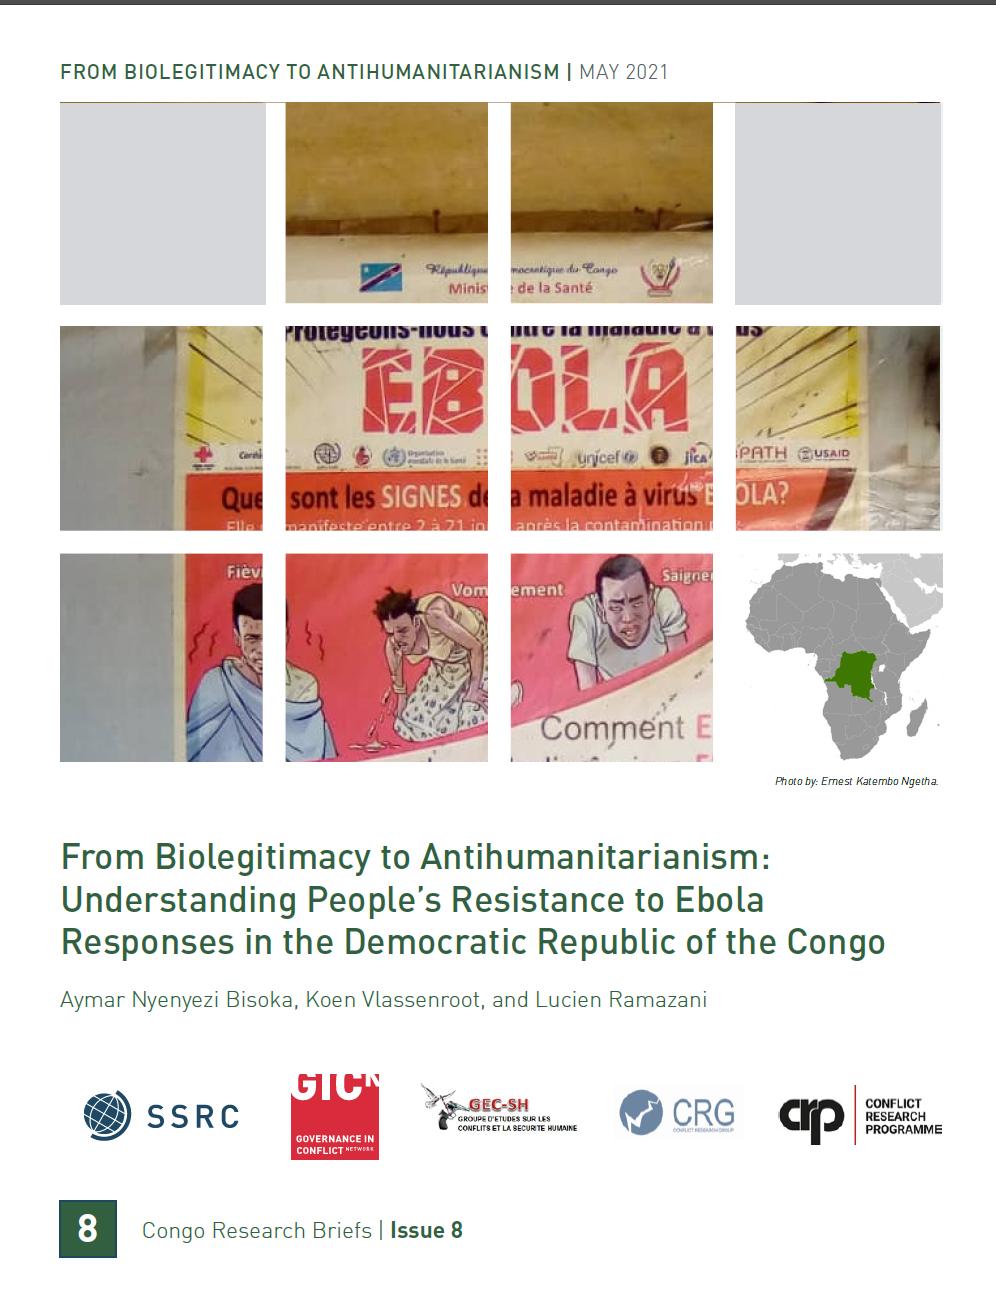 from-biolegitimacy-to-antihumanitarianism-understanding-people-s-resistance-to-ebola-responses-in-the-democratic-republic-of-the-congo